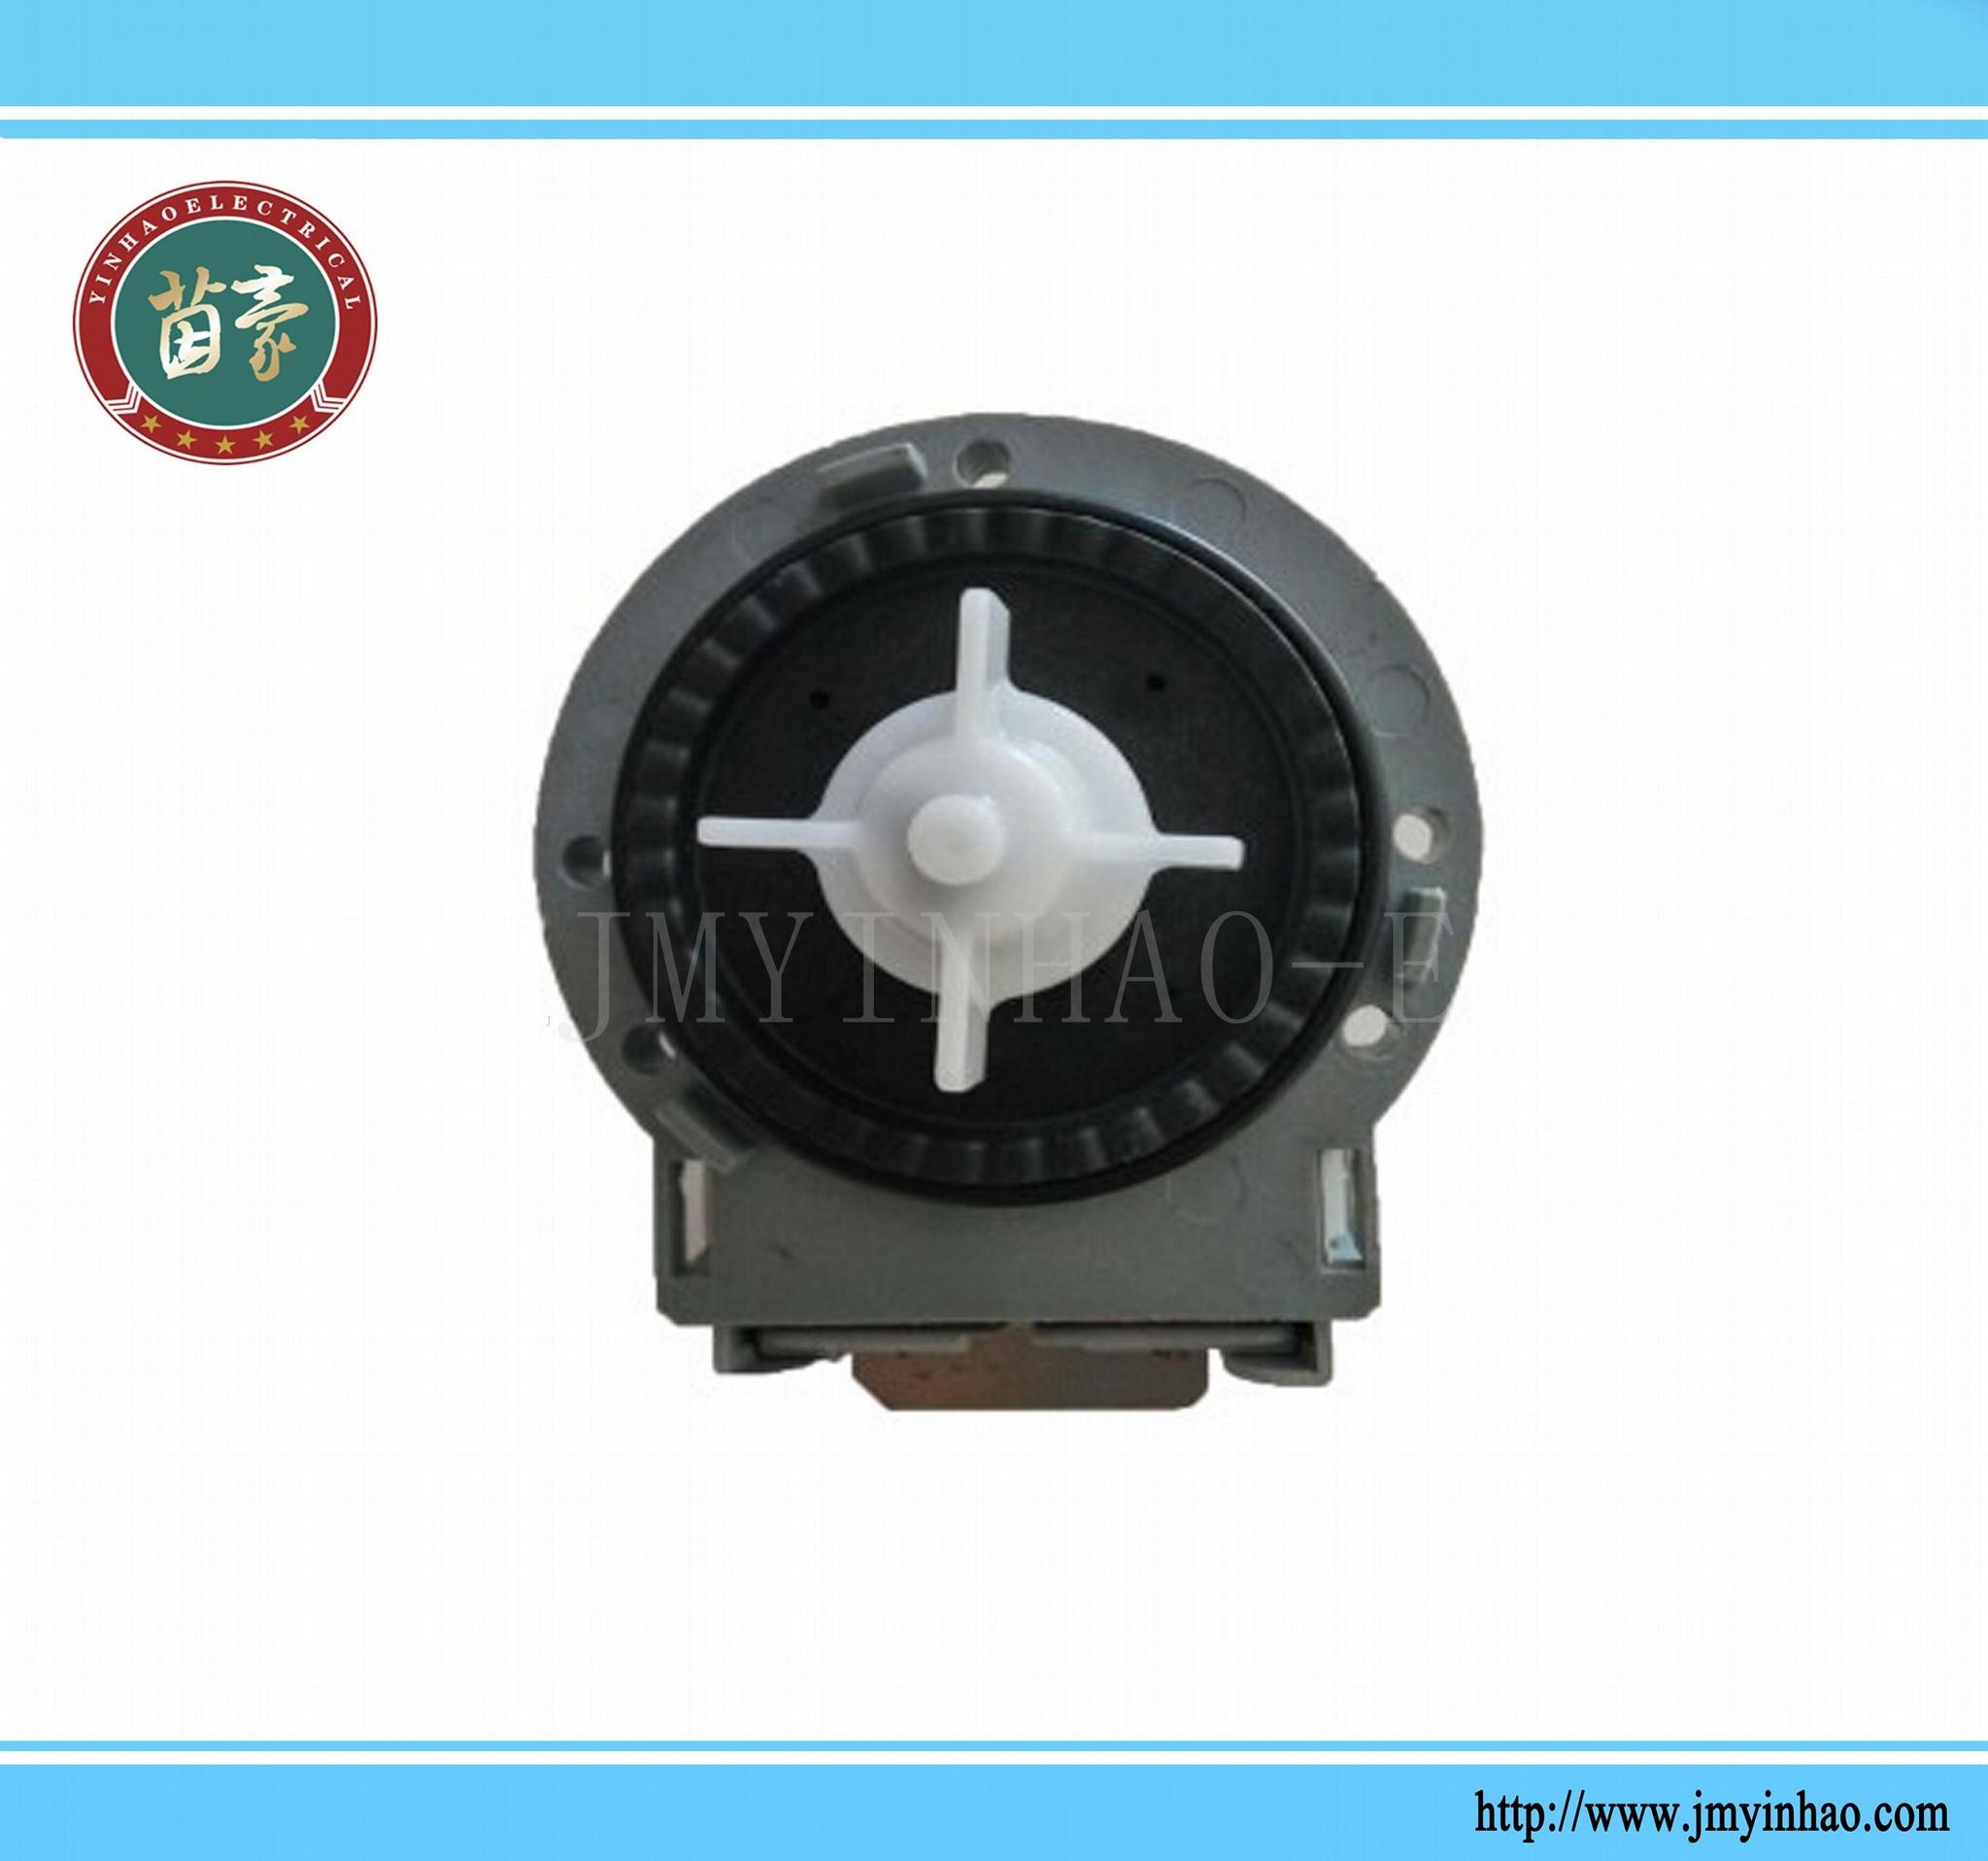 Replacement Askoll M231XP drain motor/40W Washer drain water pump 2